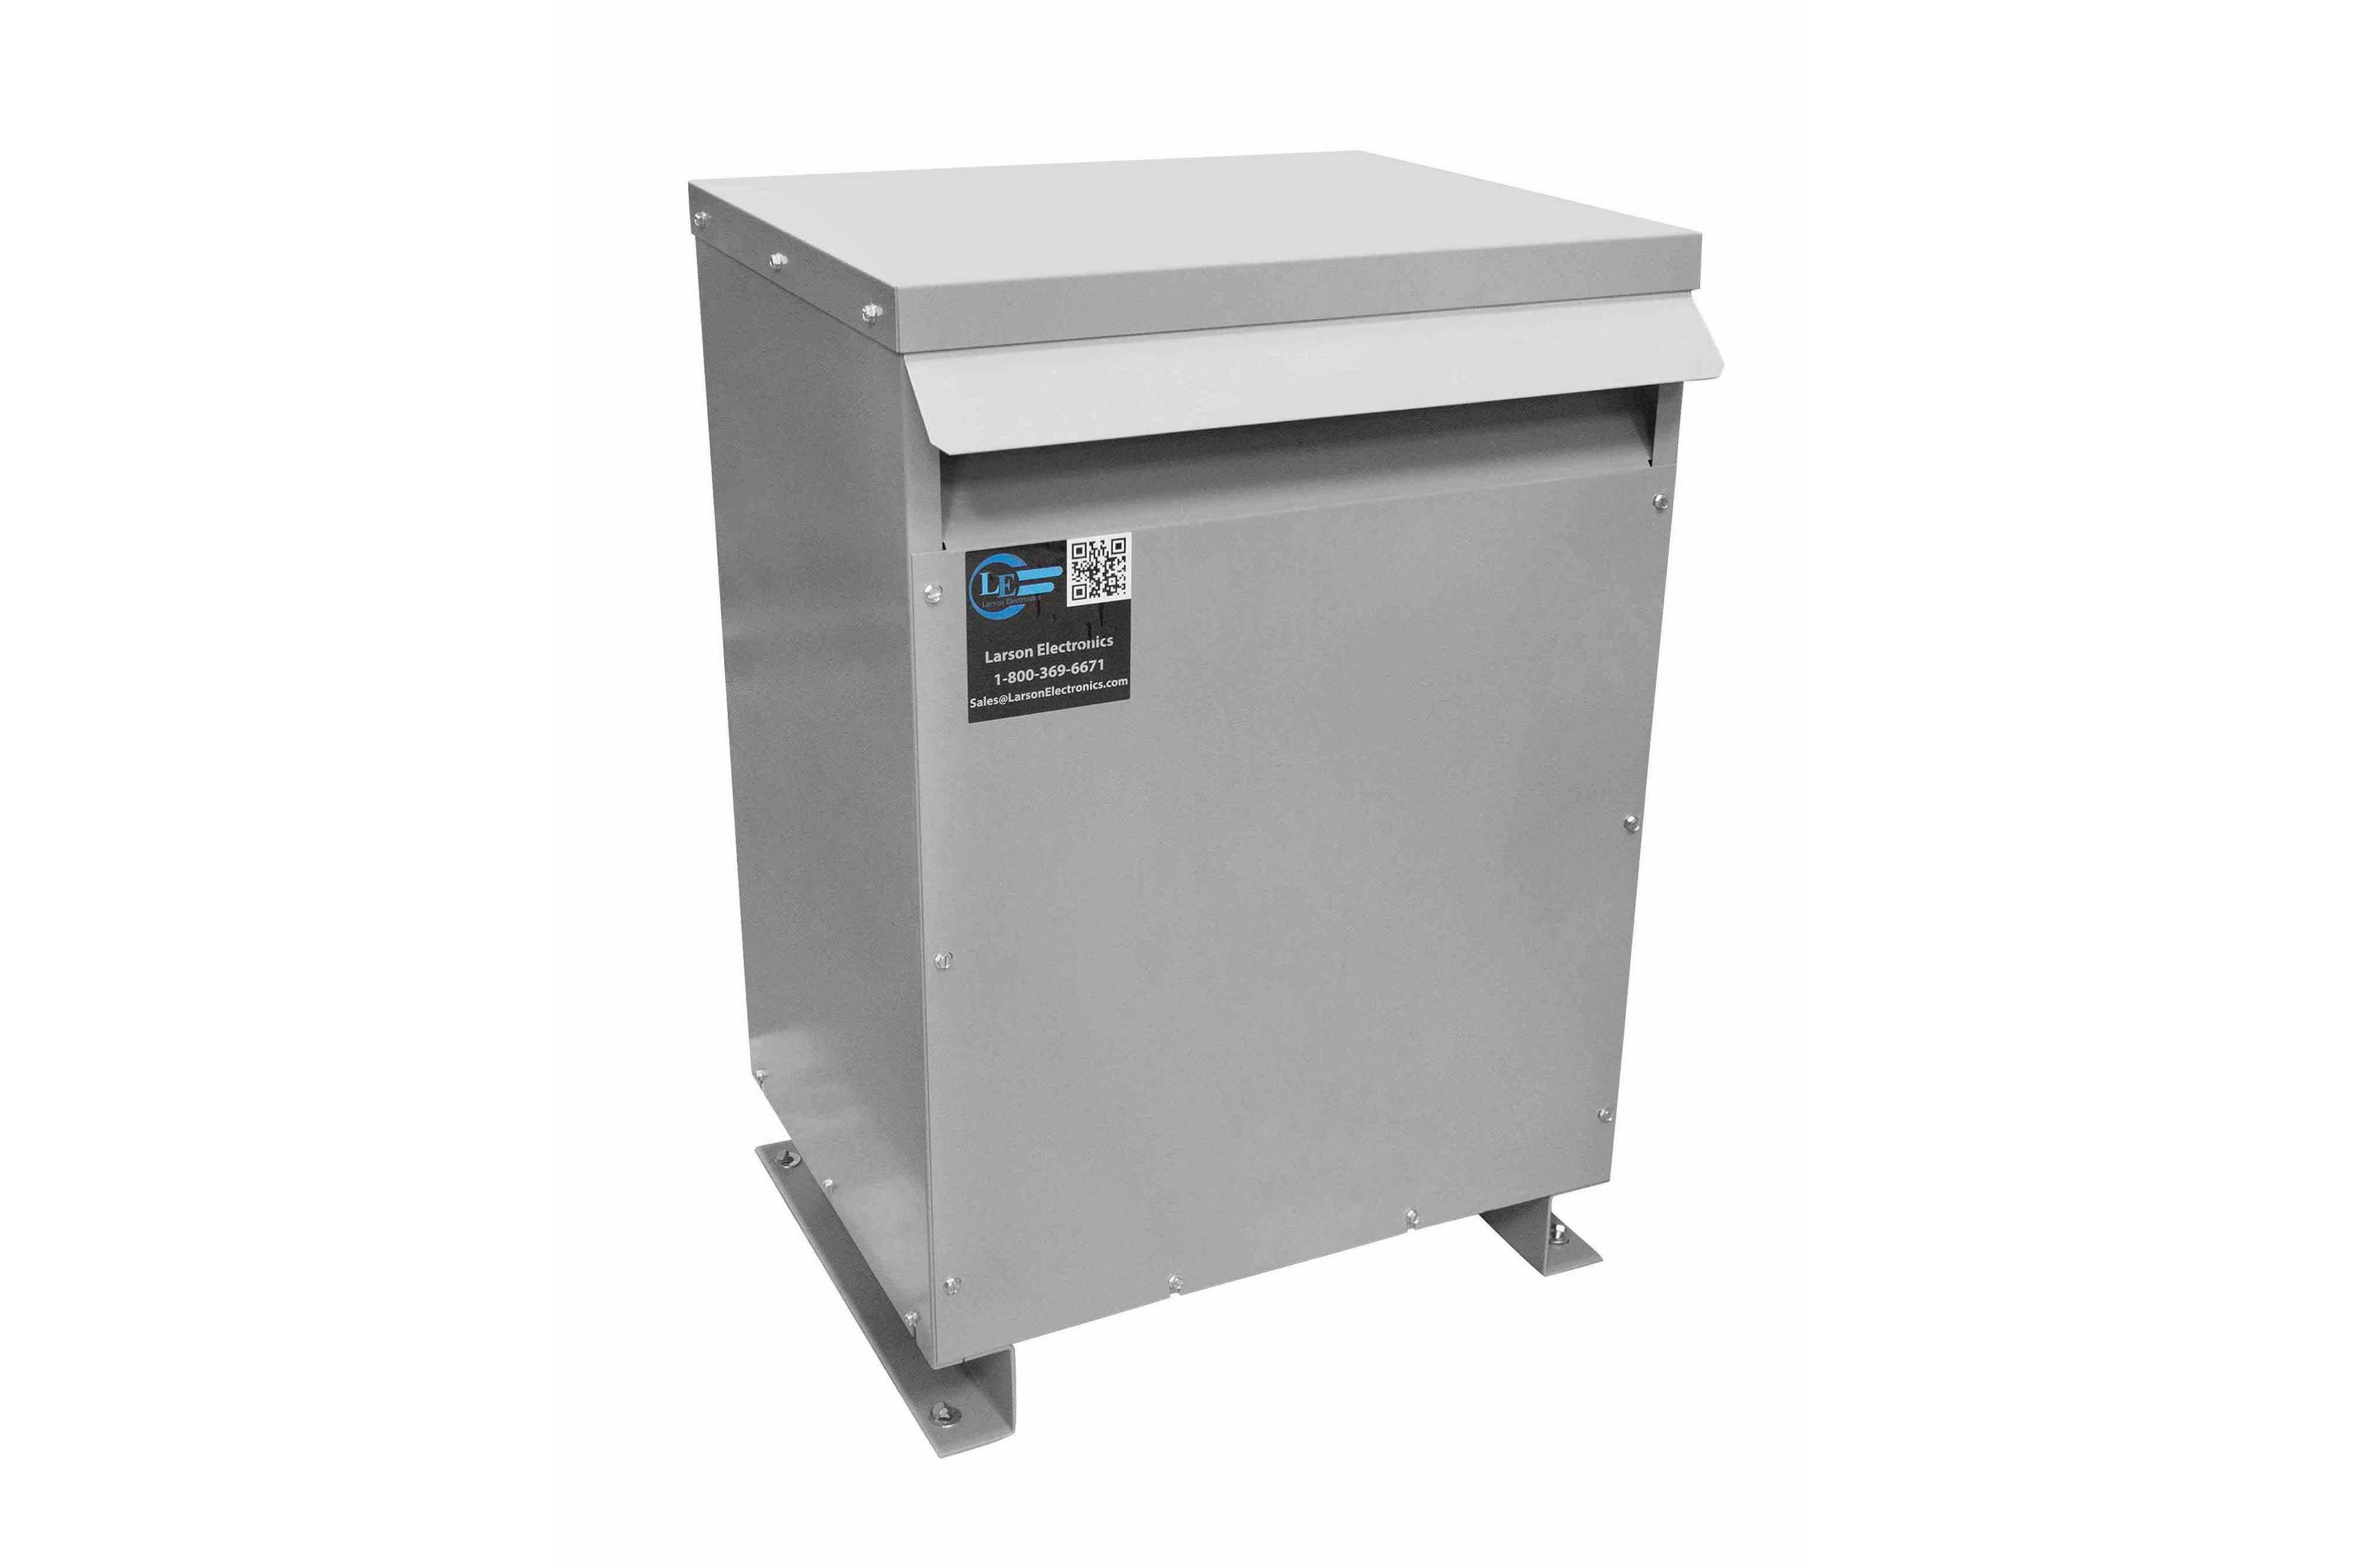 38 kVA 3PH Isolation Transformer, 208V Wye Primary, 600V Delta Secondary, N3R, Ventilated, 60 Hz